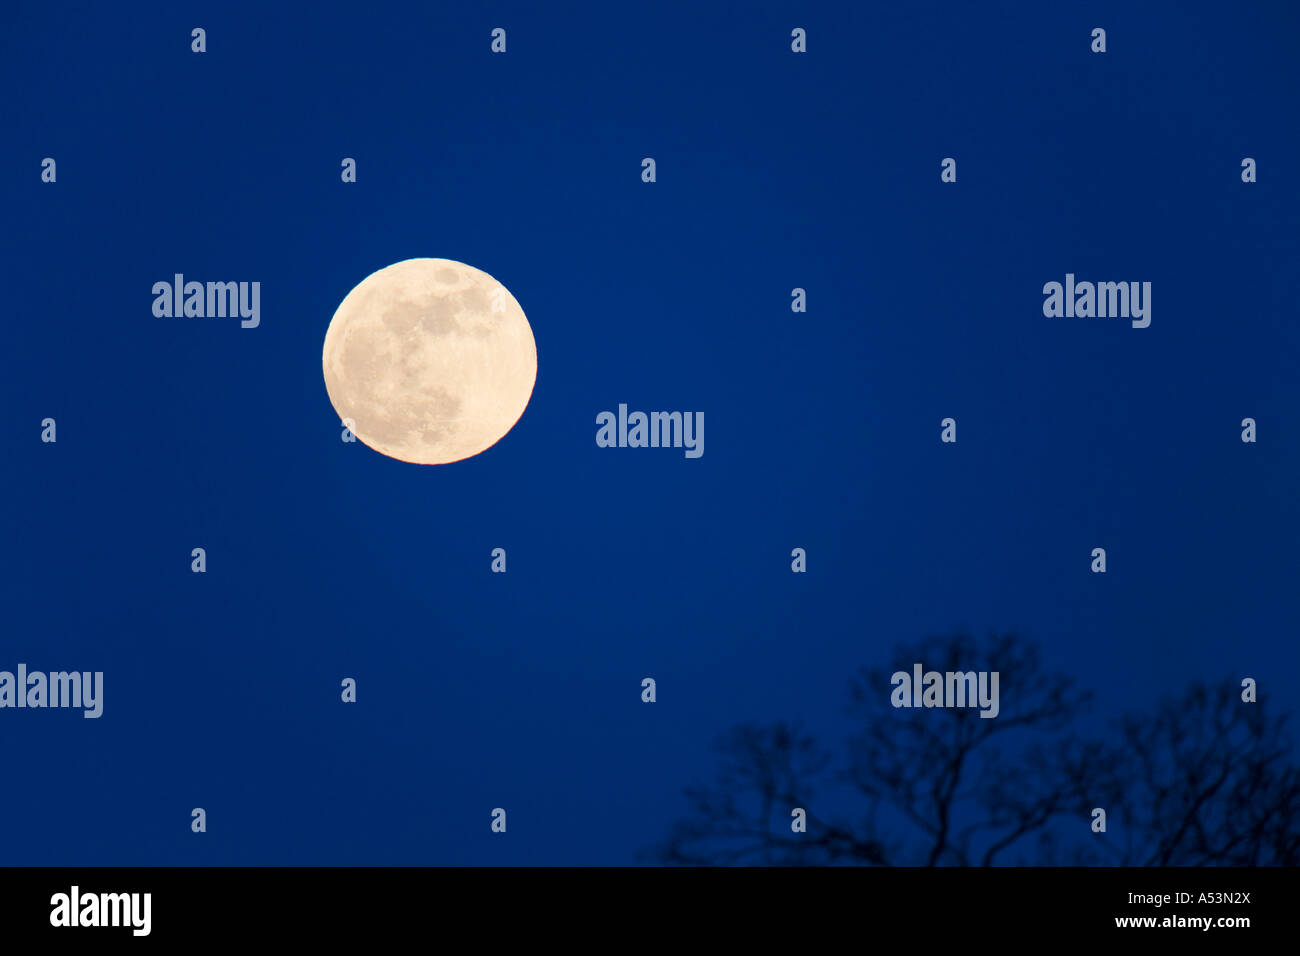 Full moon in night sky over tree tops England UK United Kingdom GB Great Britain British Isles - Stock Image